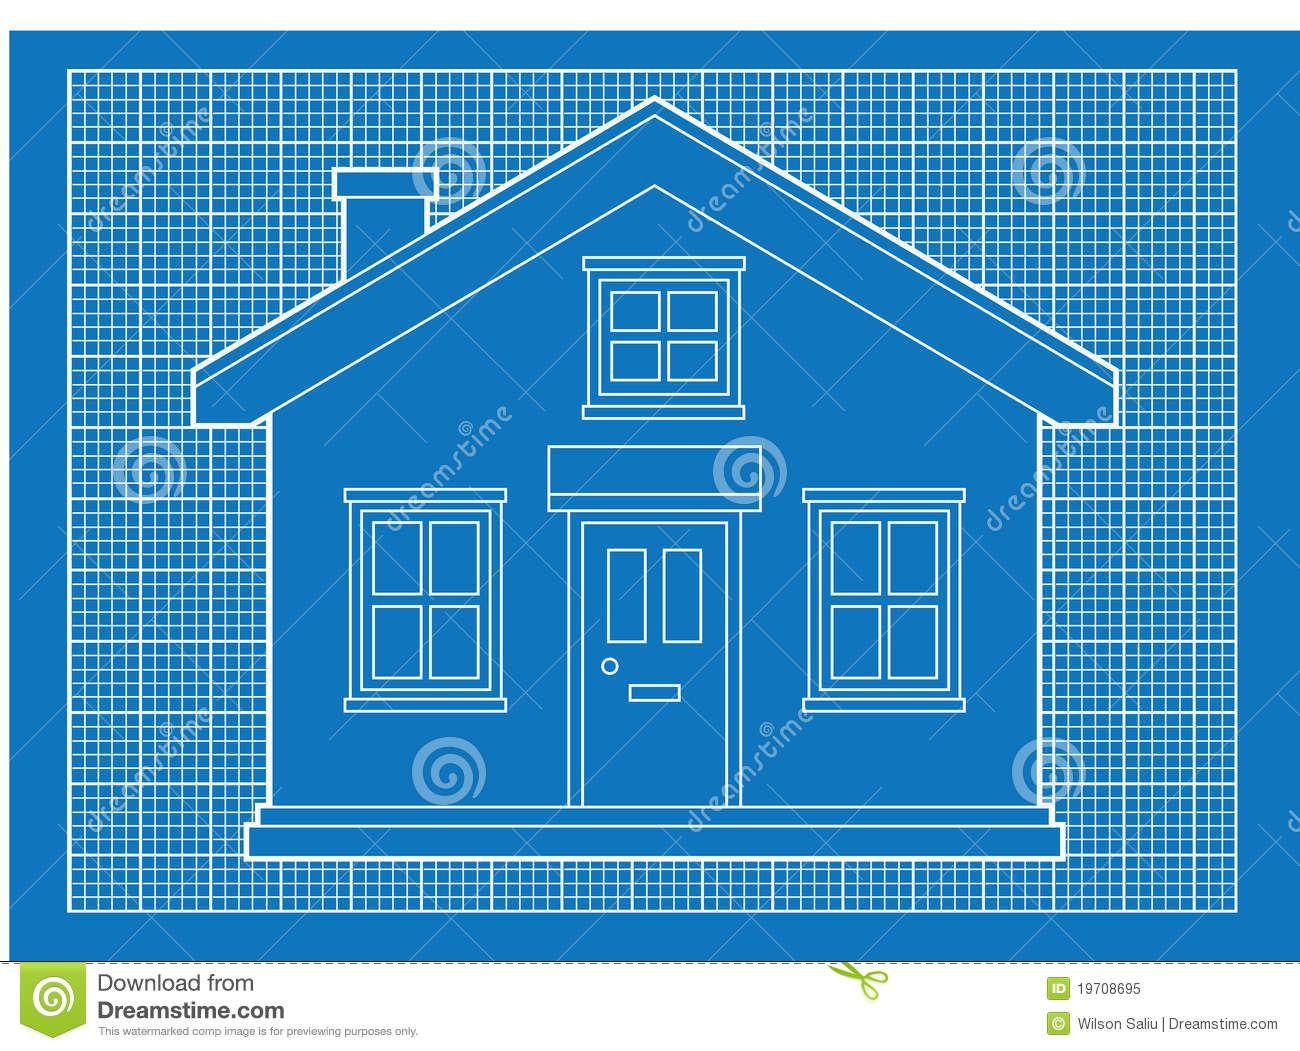 simple house blueprints royalty free stock photo image blueprint ...